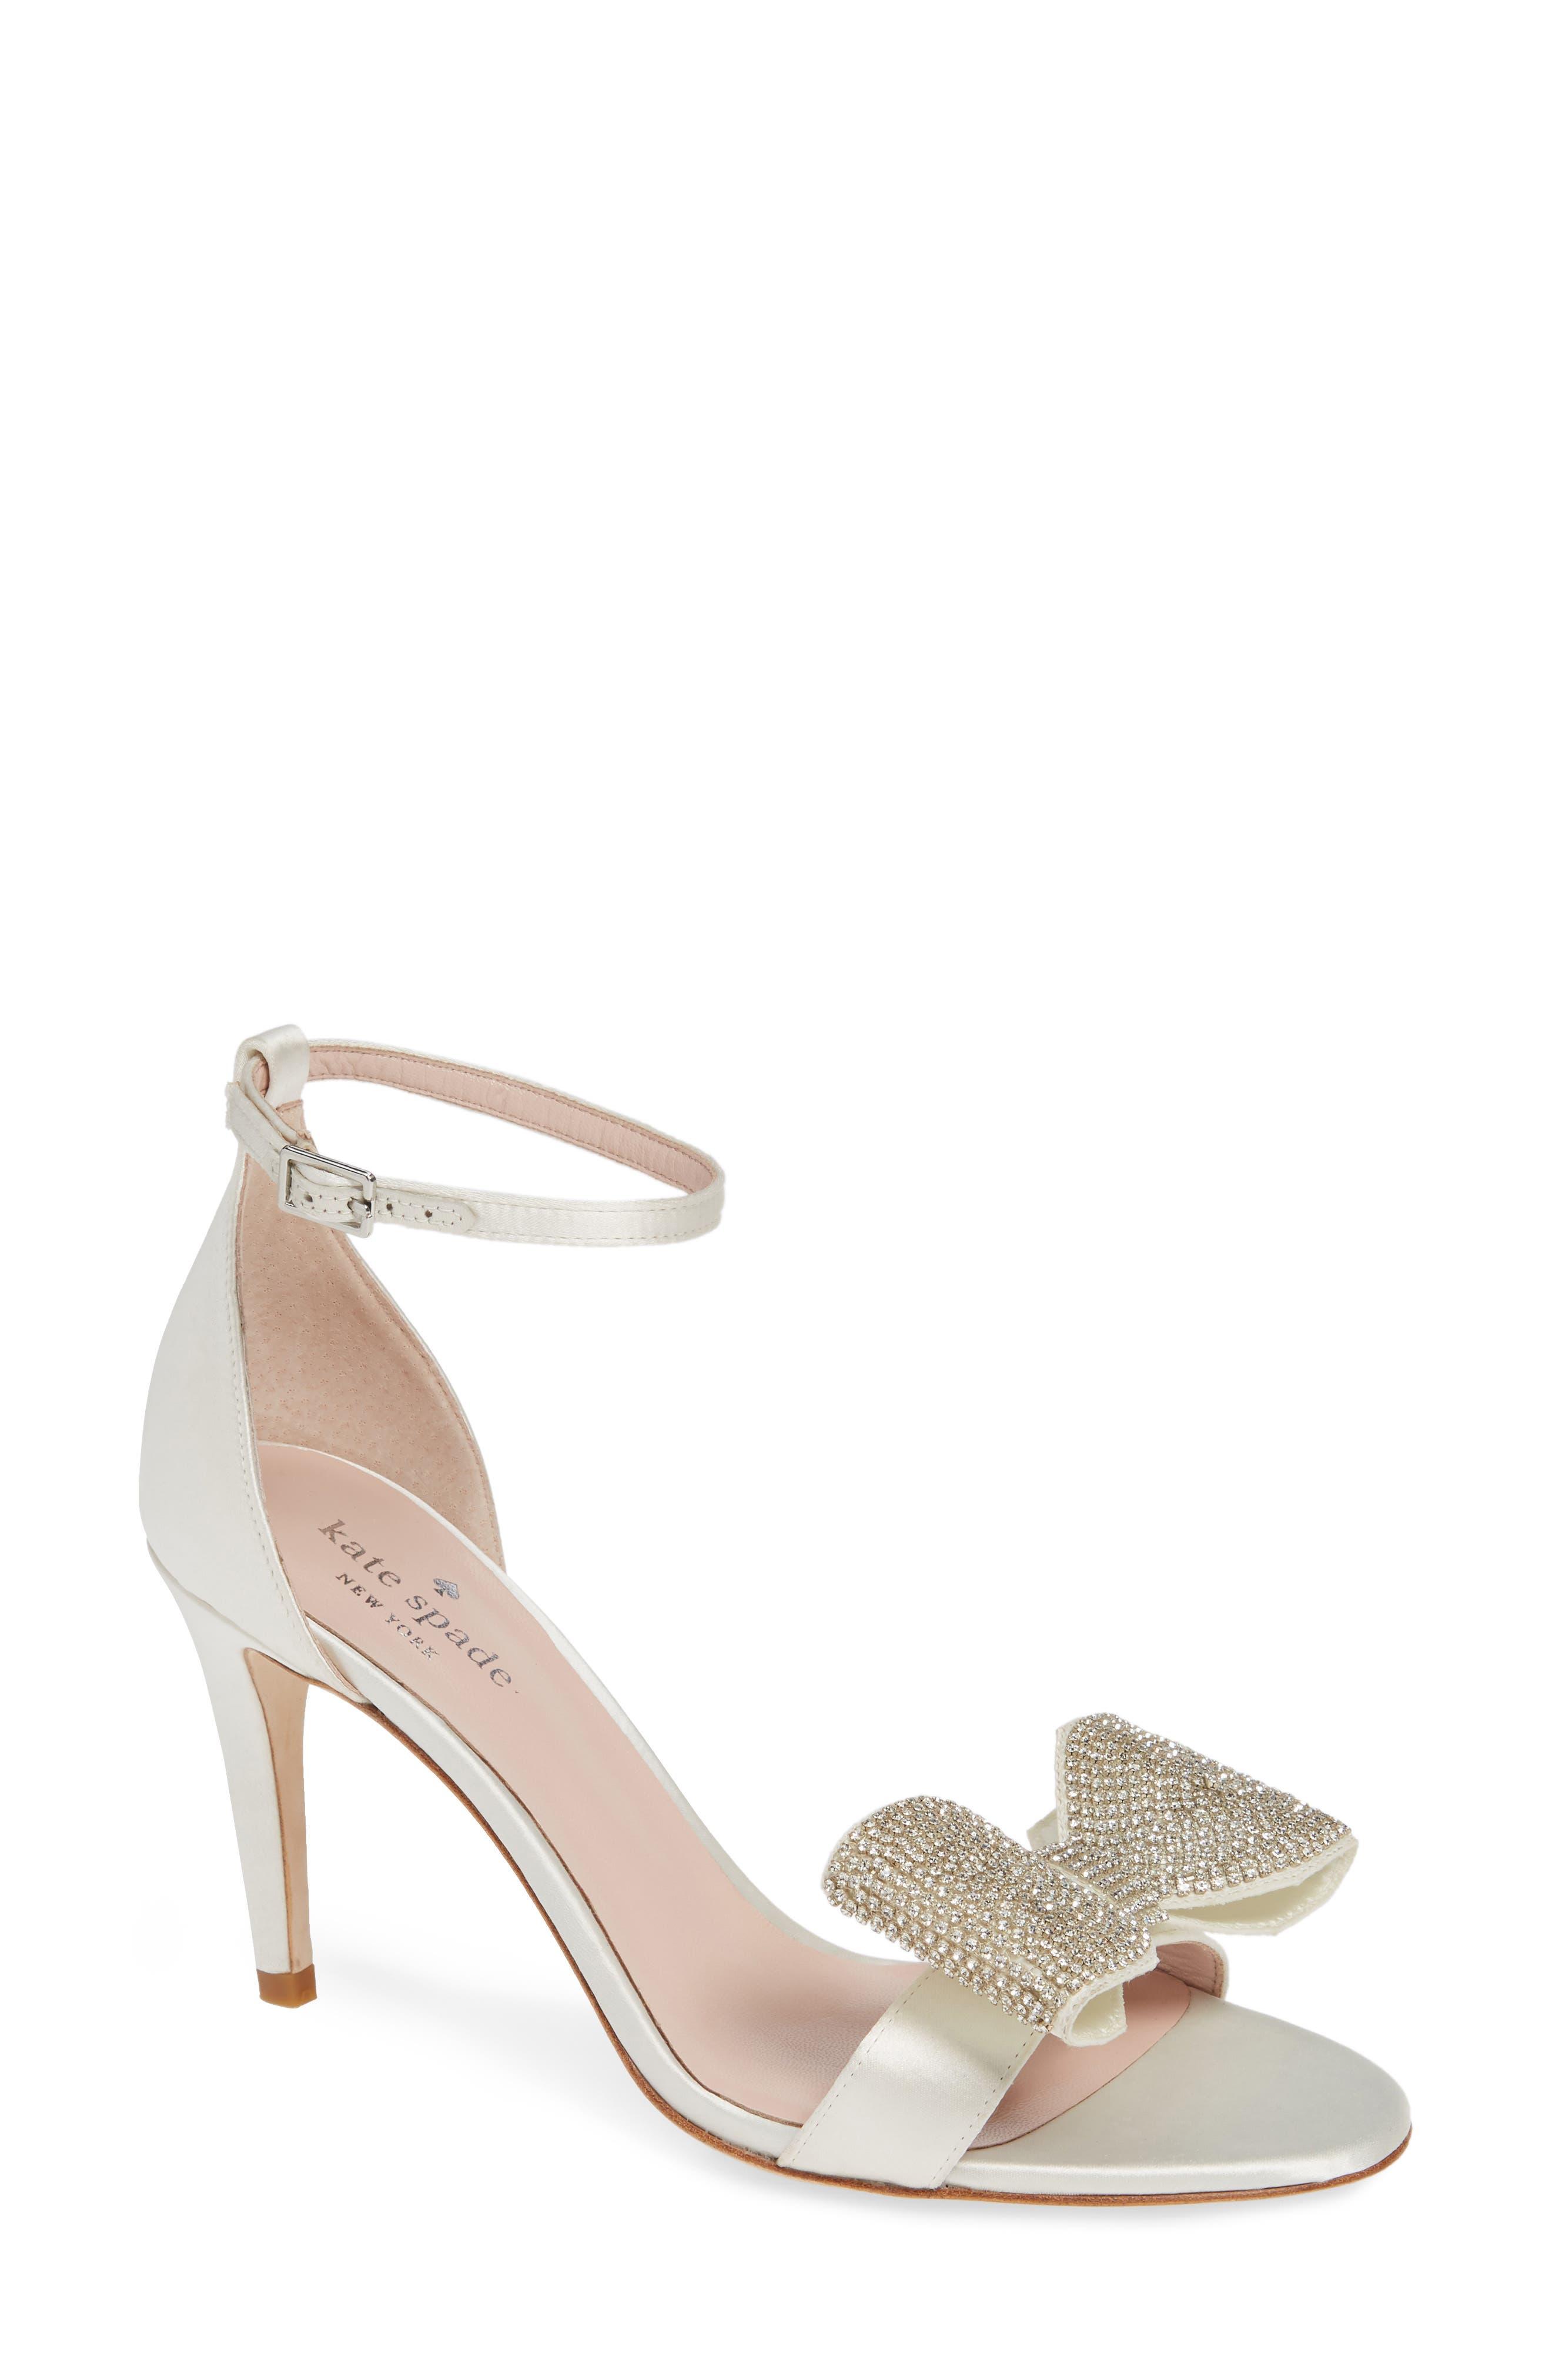 Kate Spade New York Gweneth Crystal Bow Ankle Strap Sandal